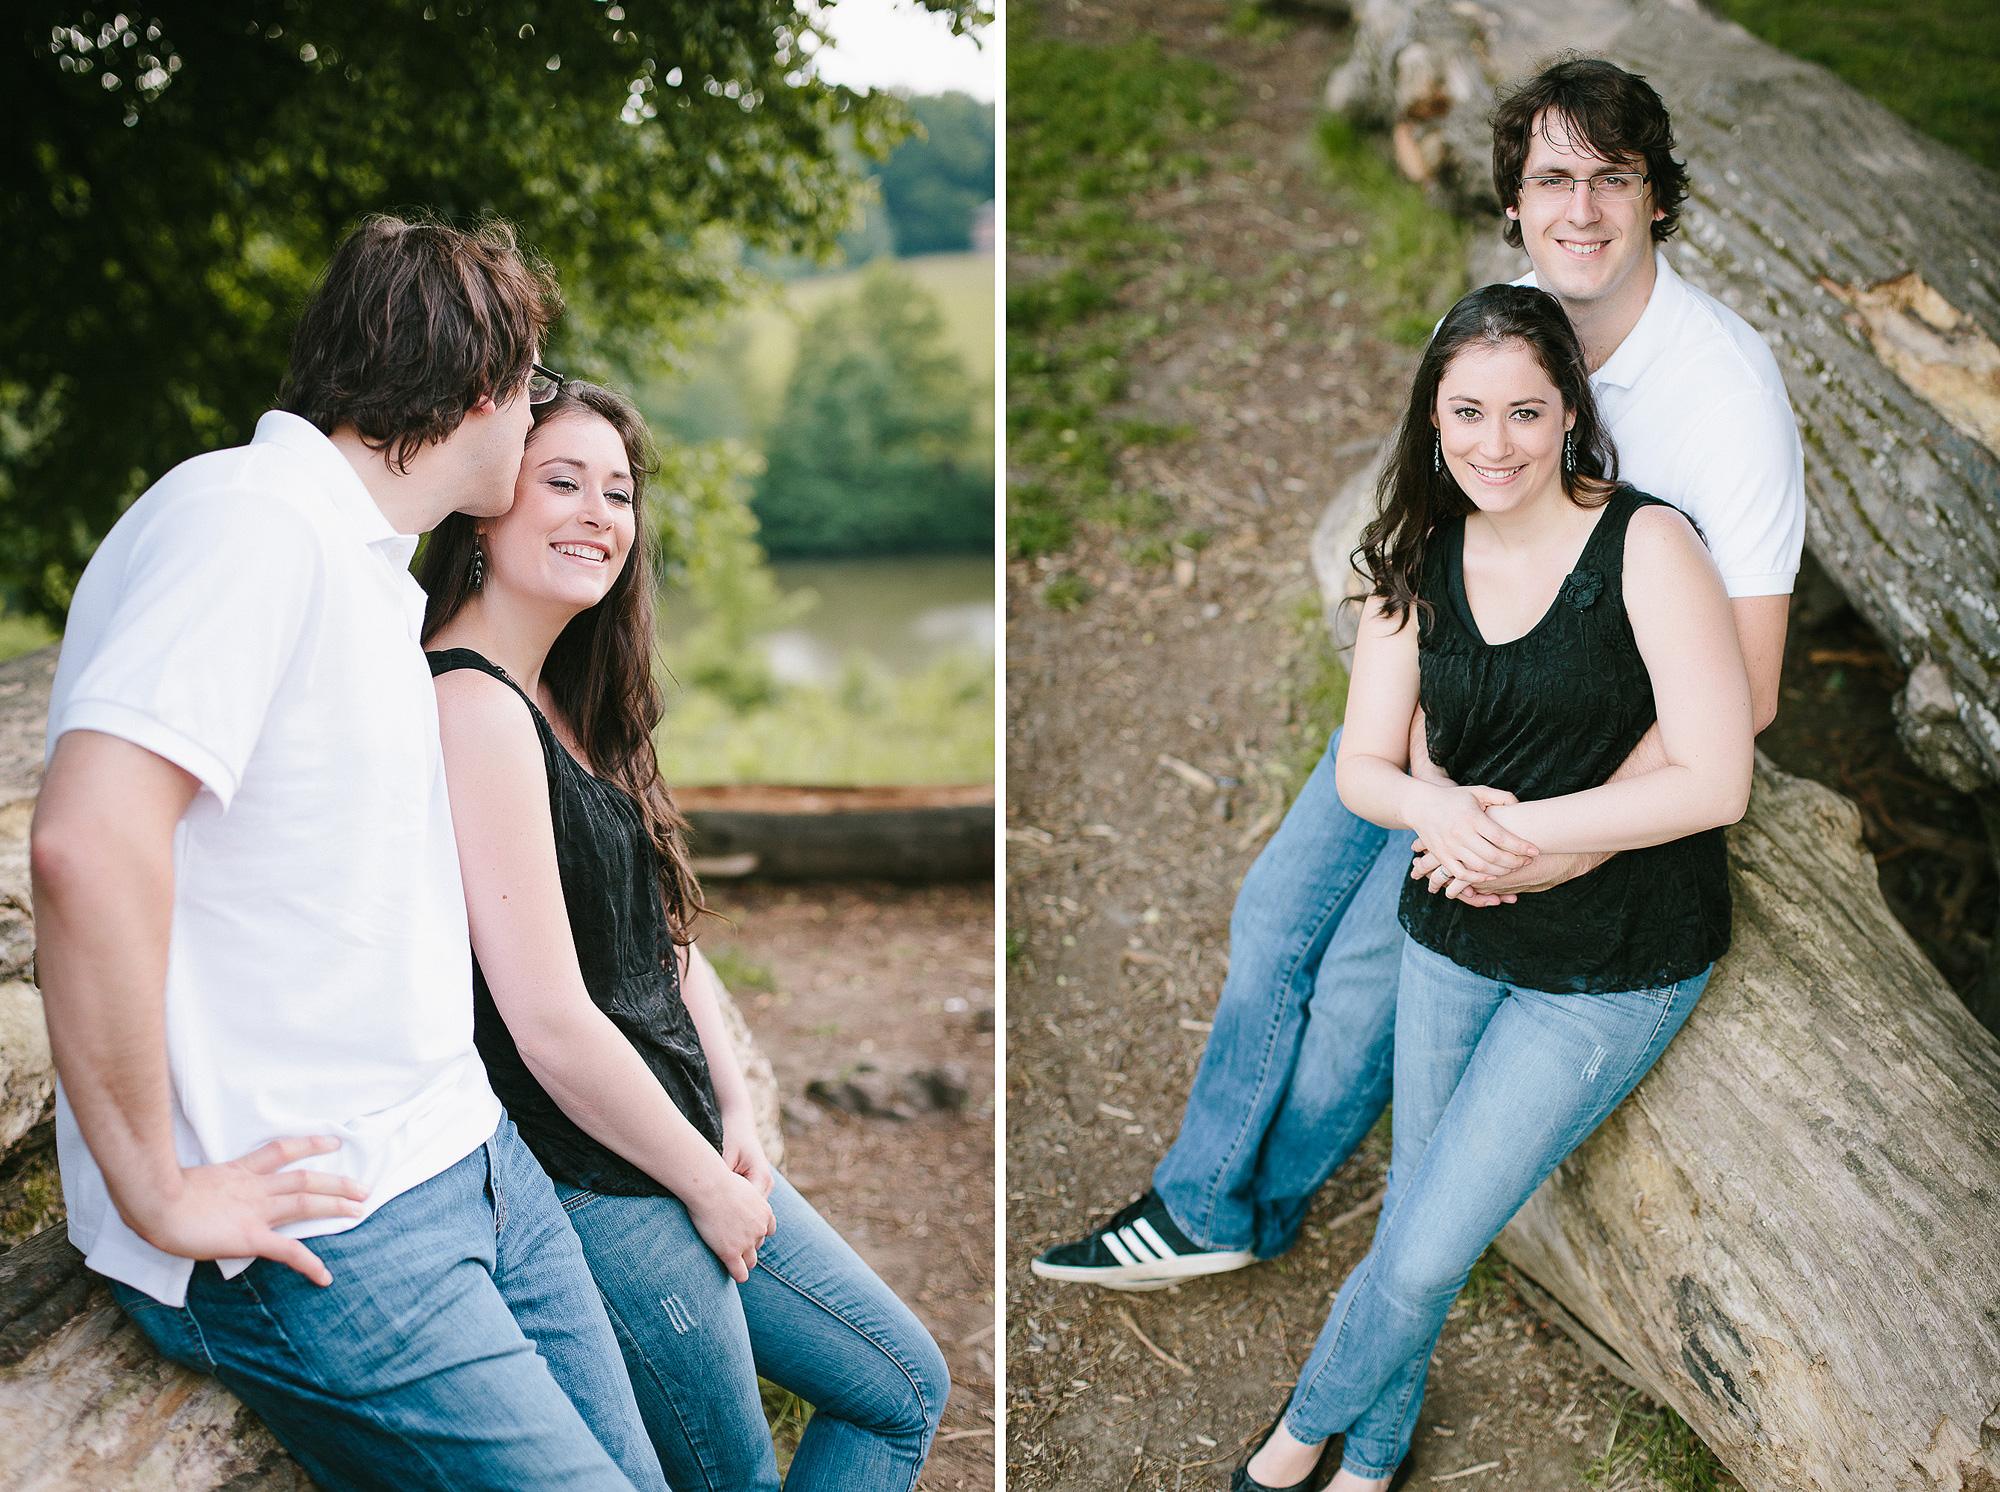 Ramona-und-Rafael-Engagement-Foto-Avec-Amis-24